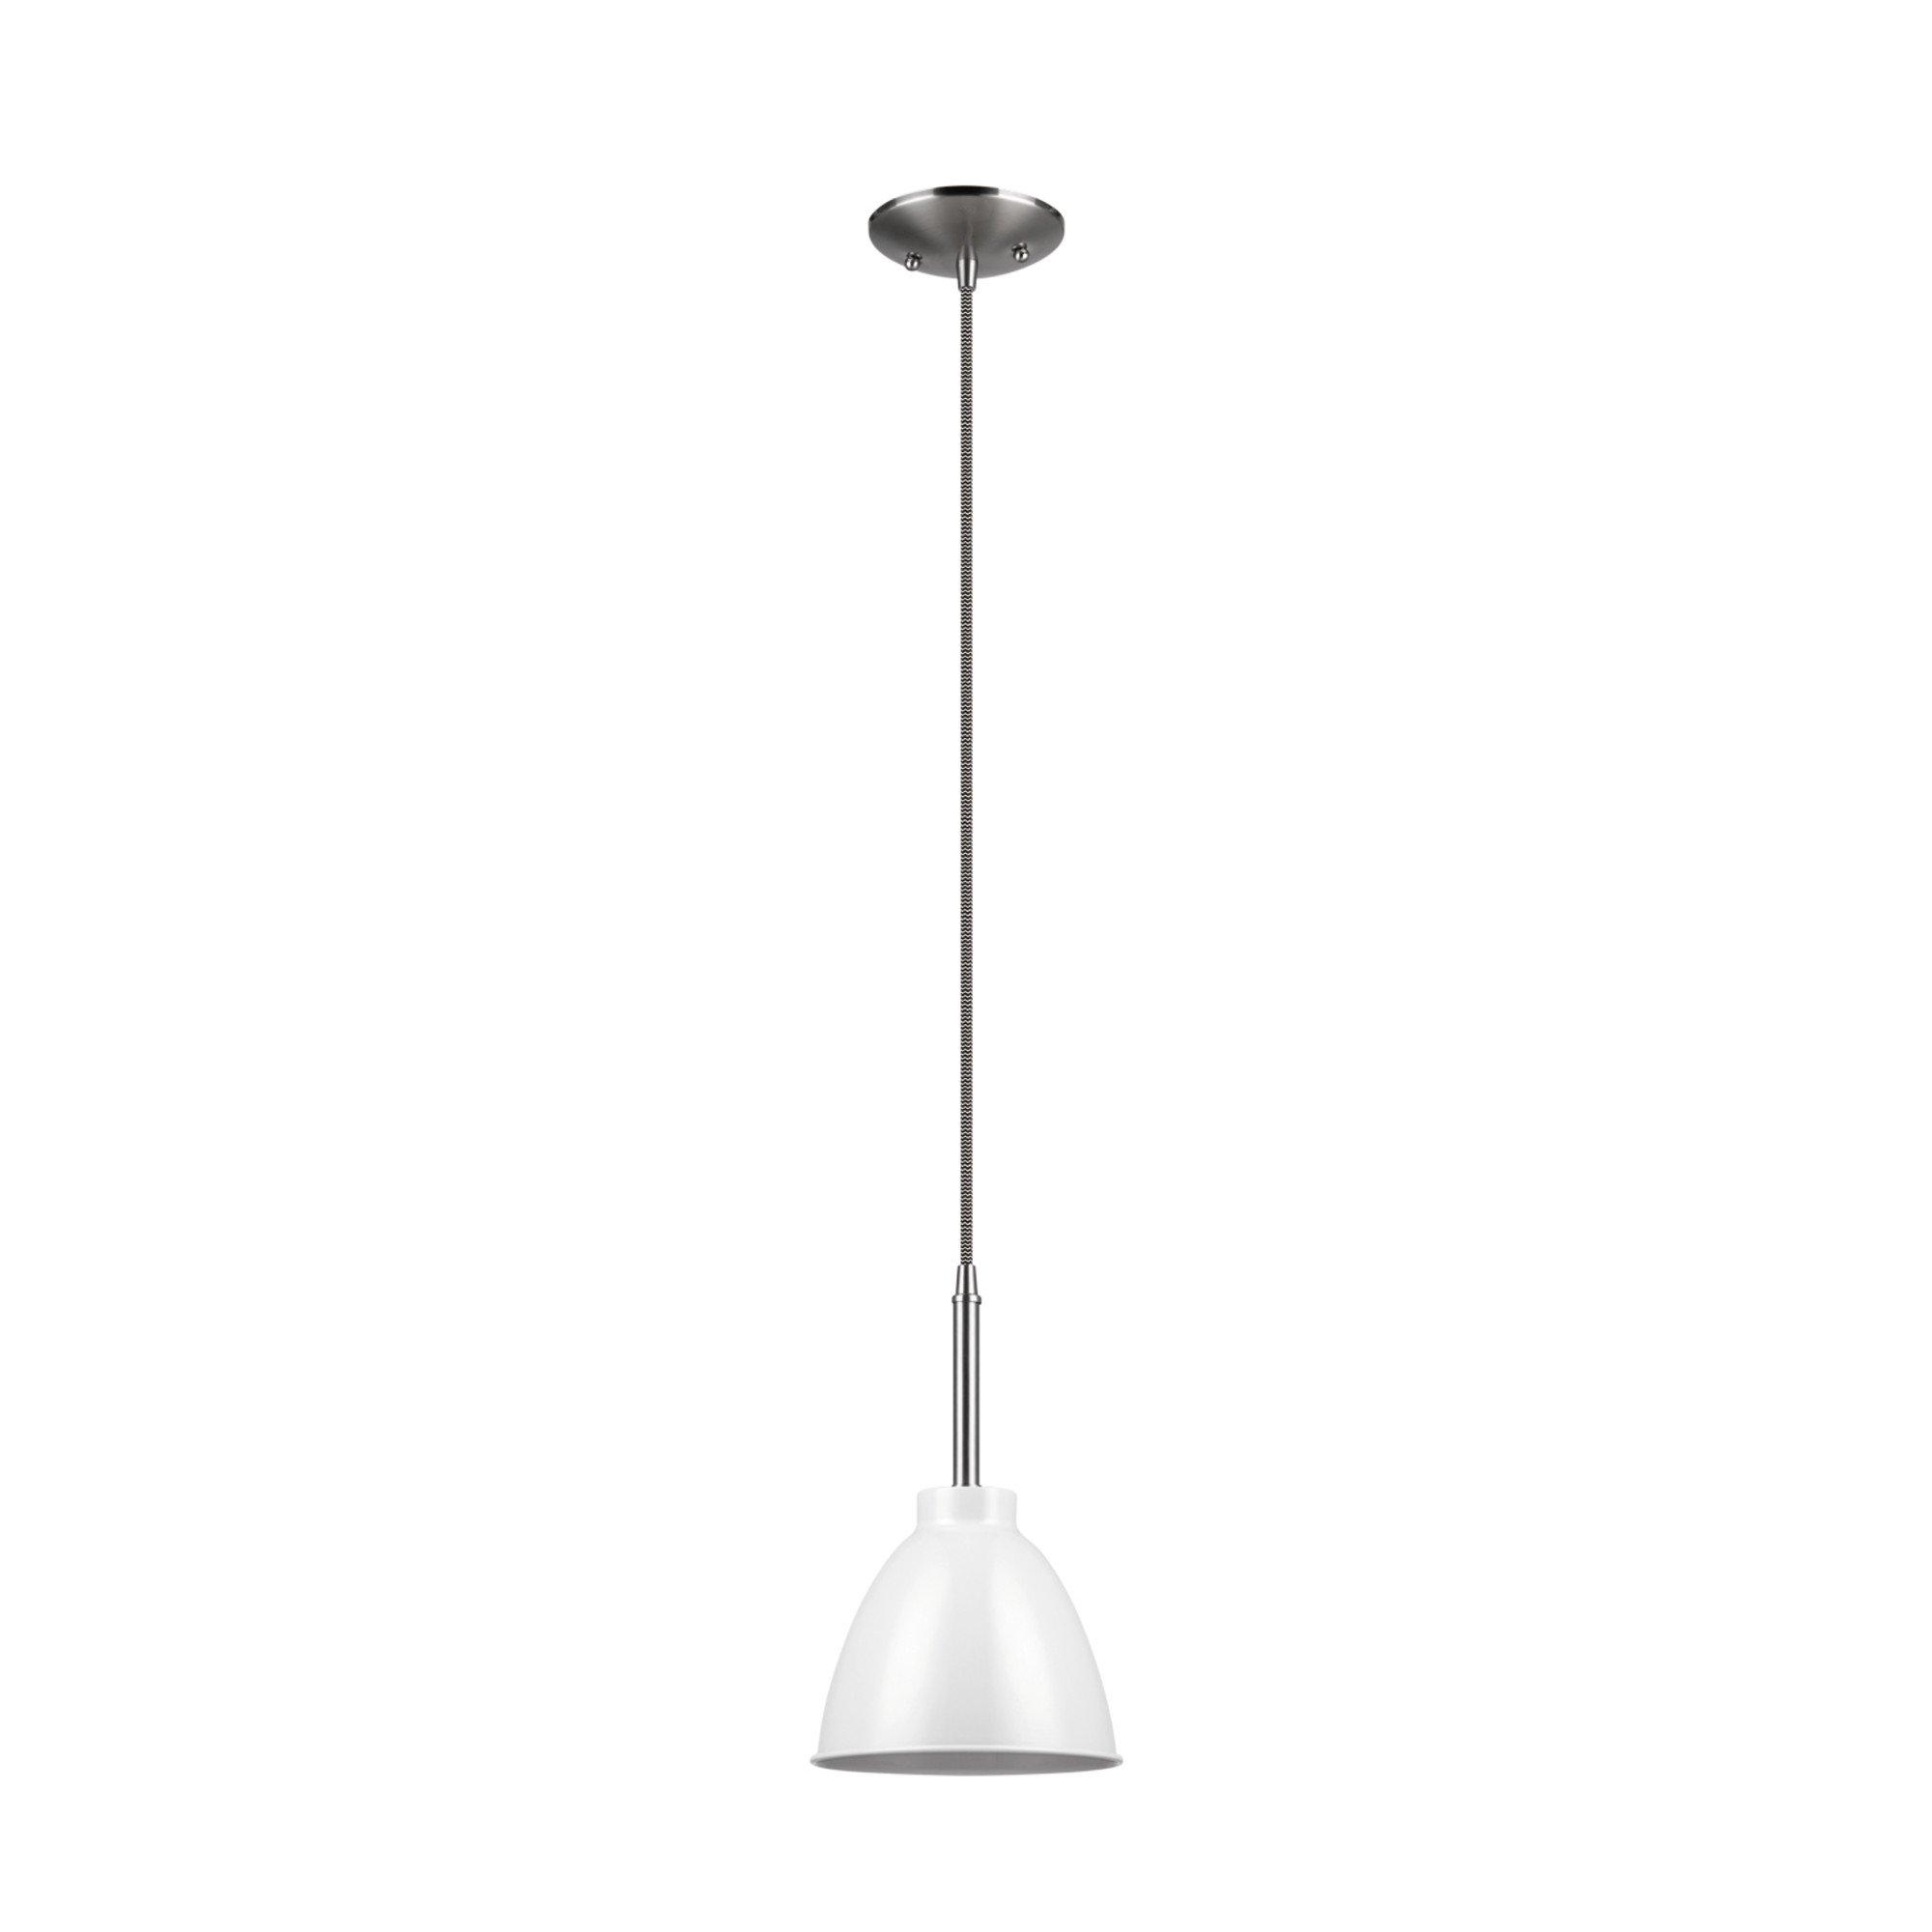 Globe Electric Rickon 1-Light Pendant, White Finish, Brushed Steel Accent, Designer Chevron Fabric Cord, 65621